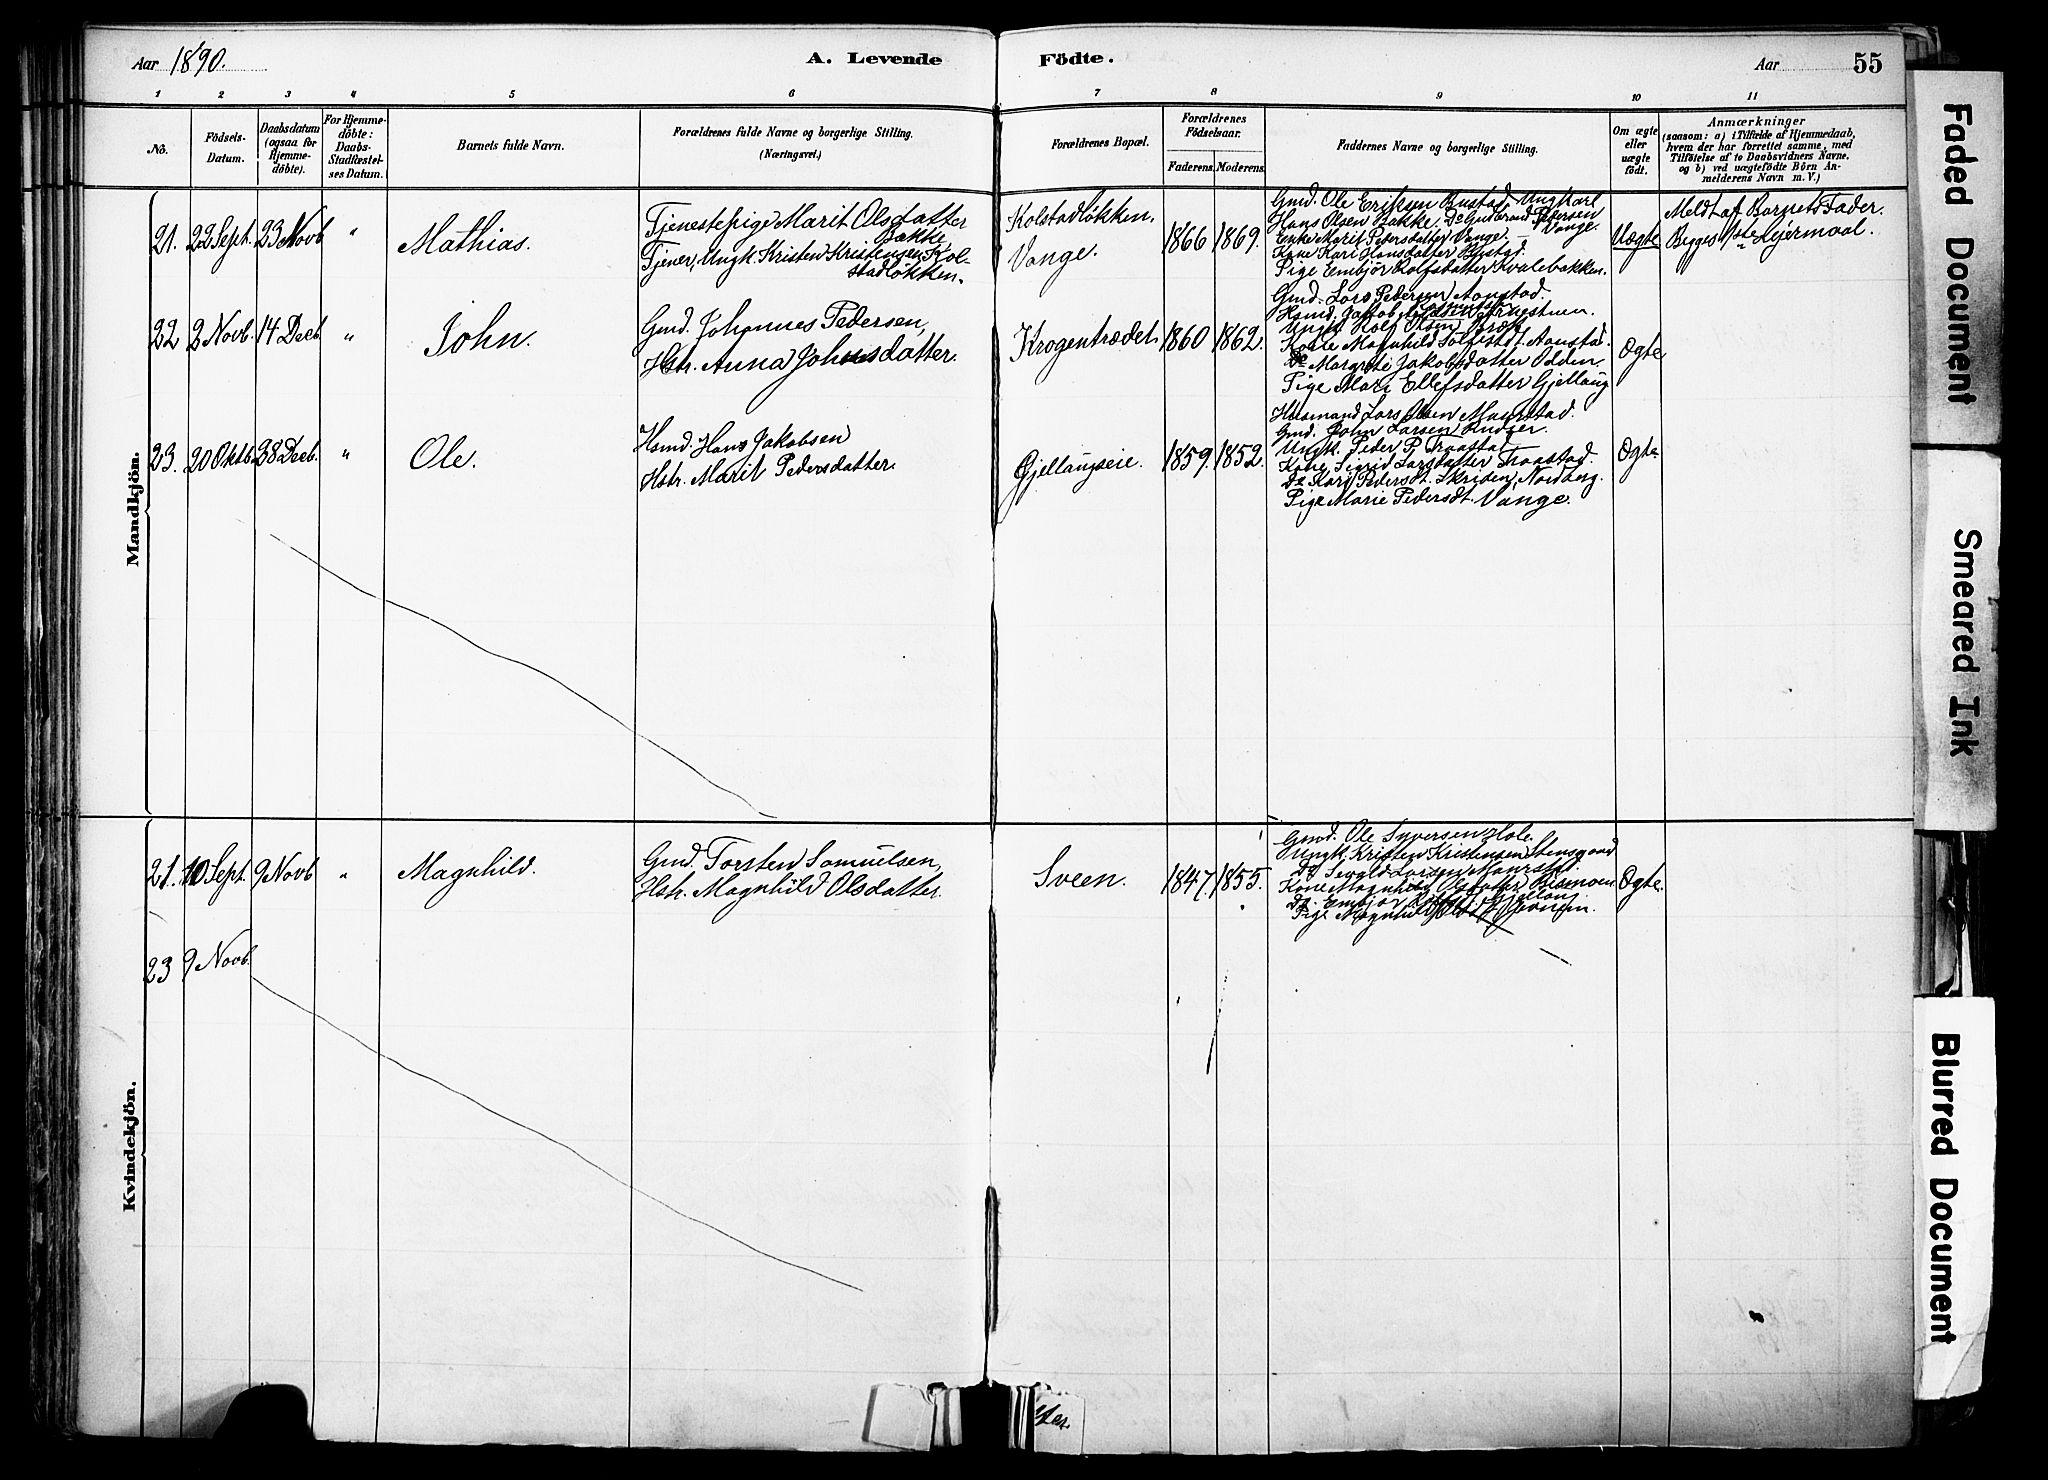 SAH, Skjåk prestekontor, Ministerialbok nr. 3, 1880-1907, s. 55